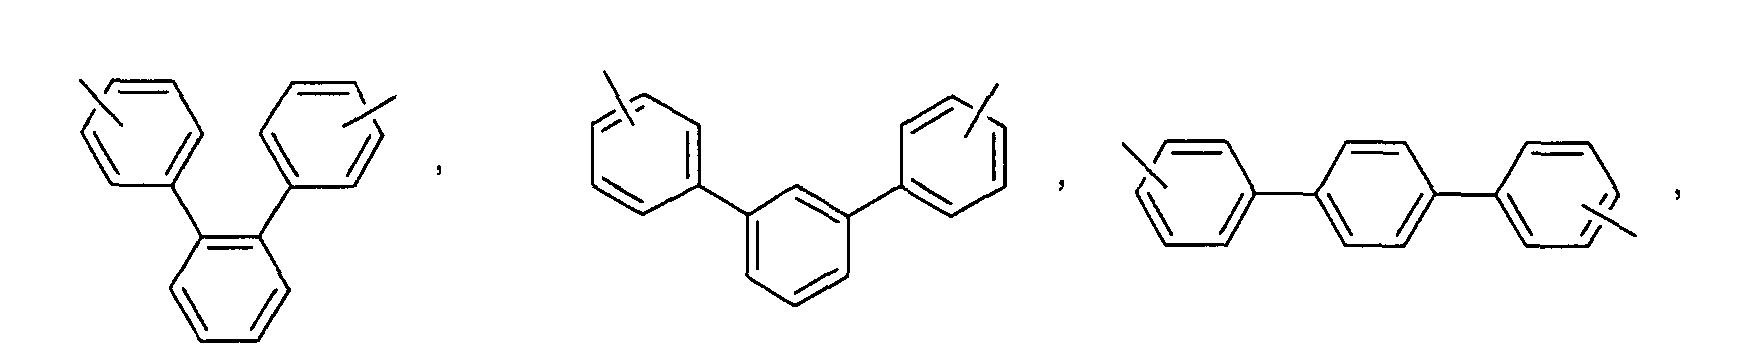 Figure 00050004